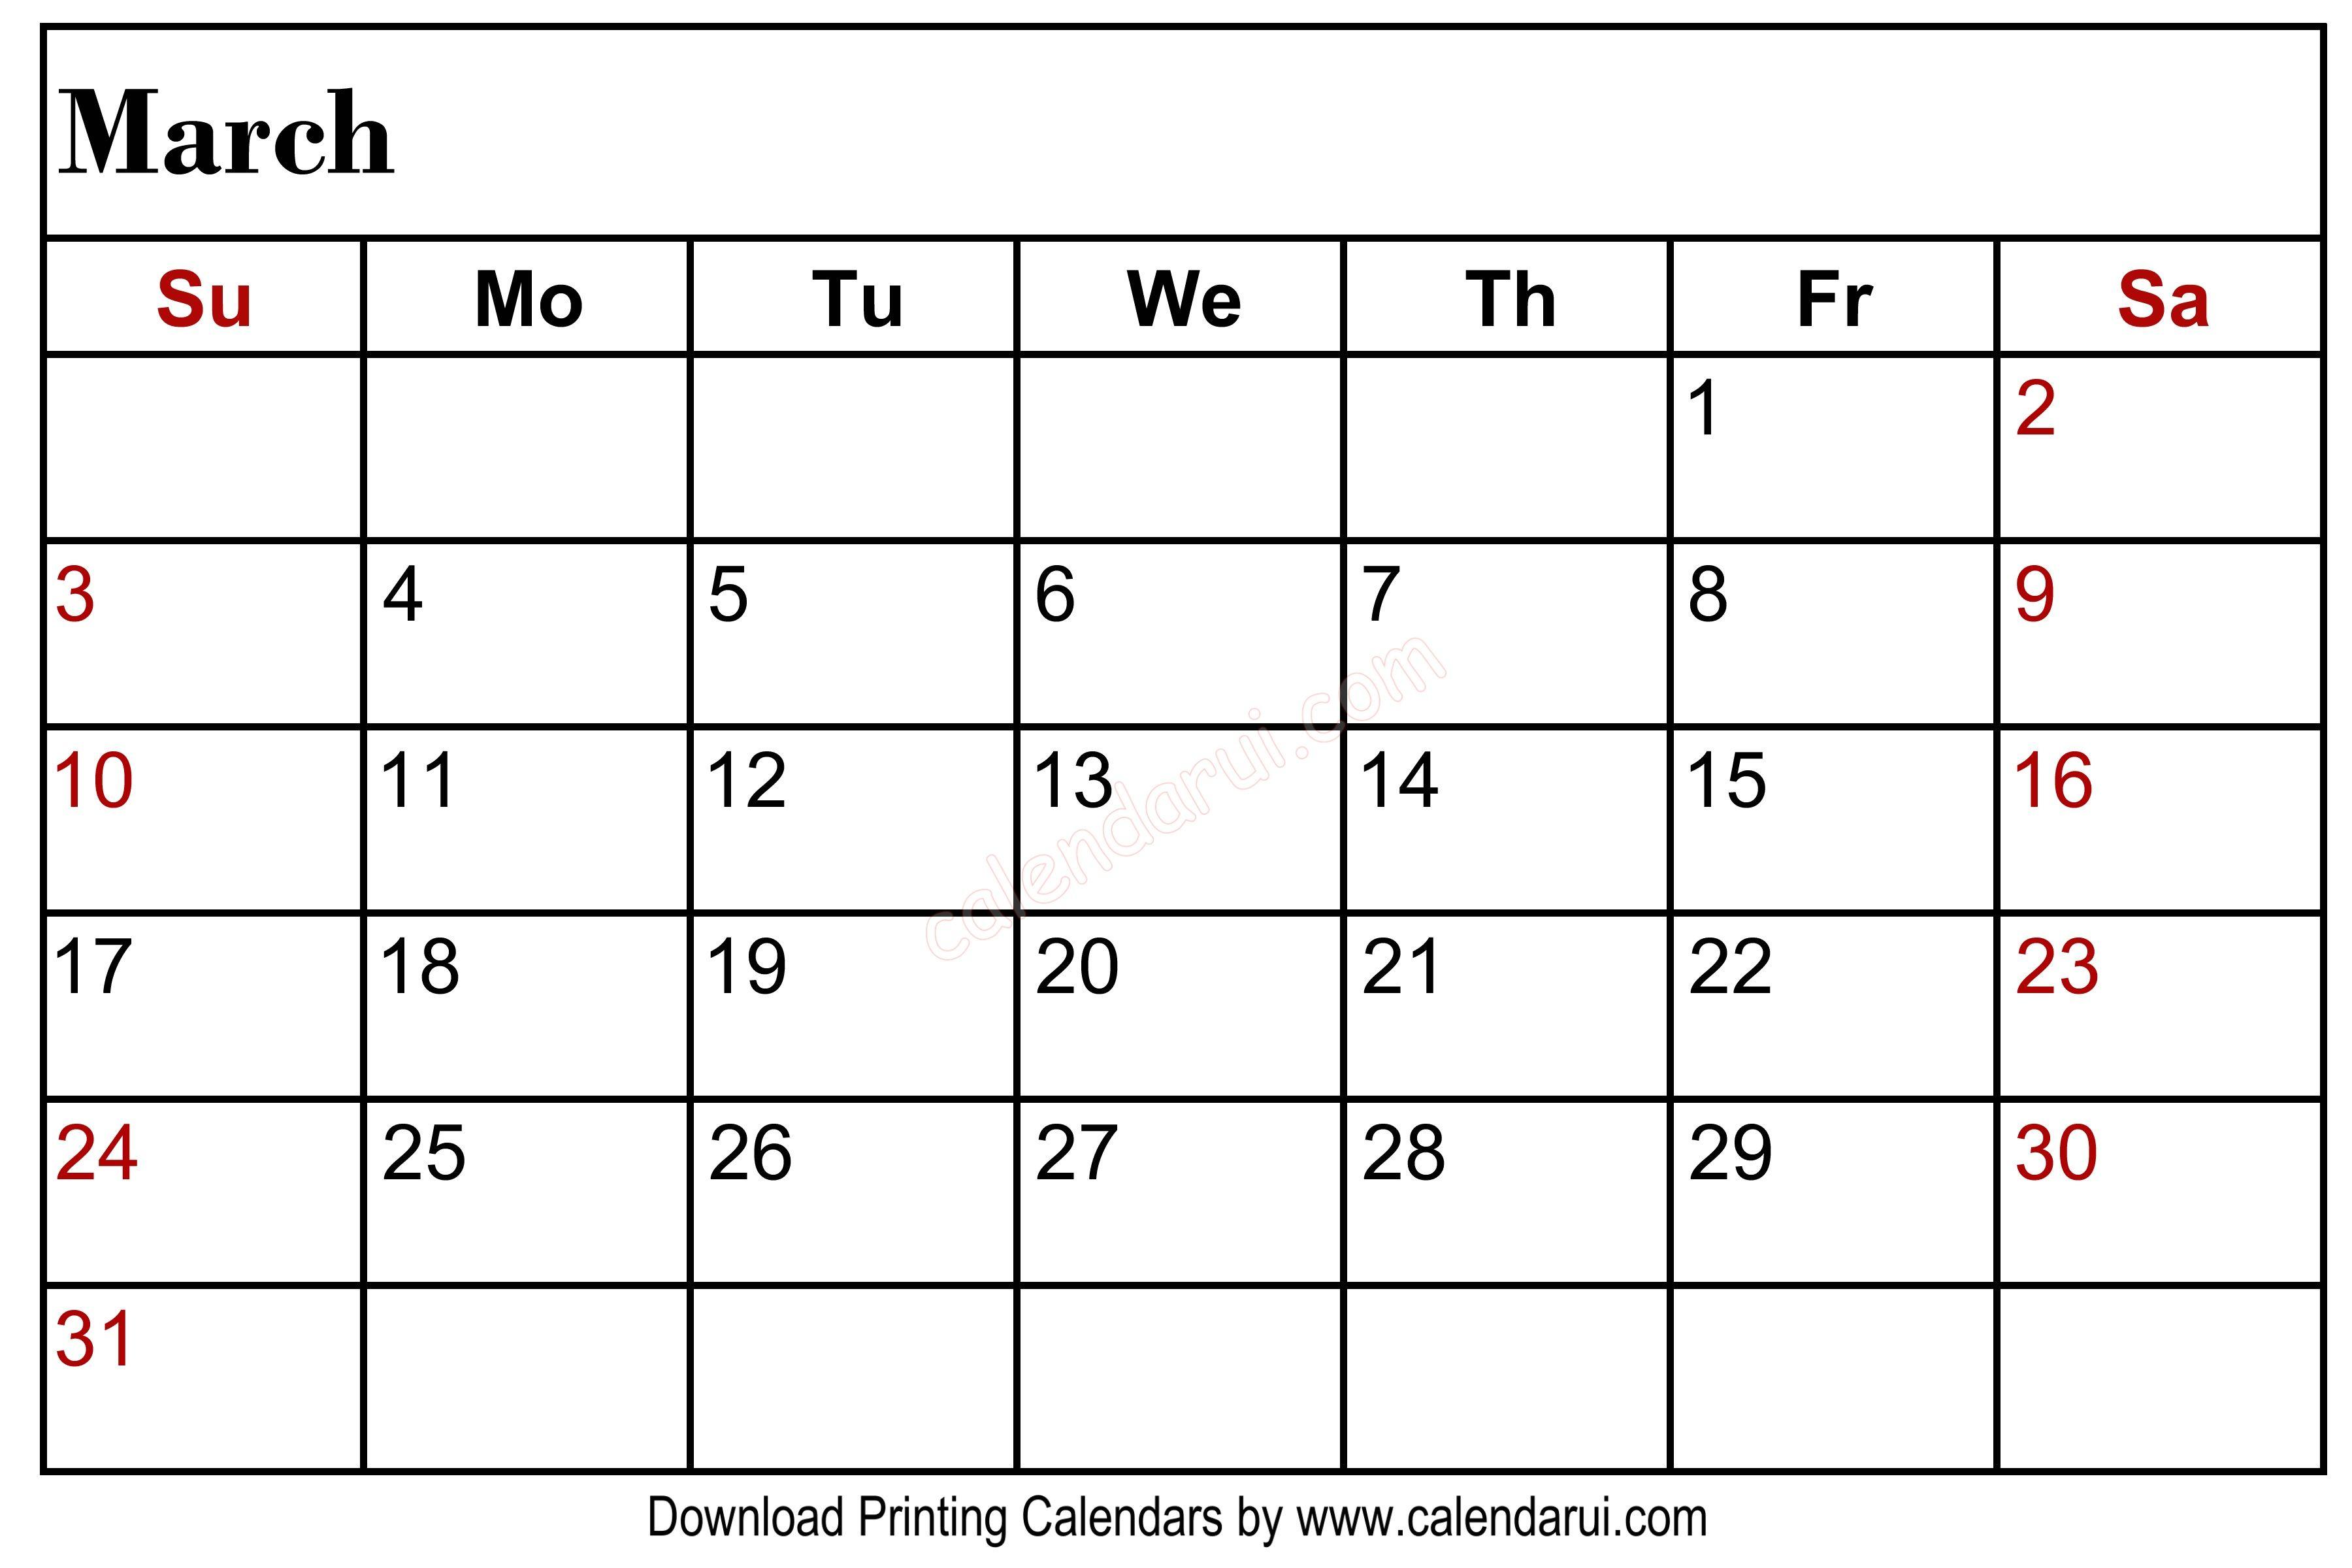 March 2020 Blank Calendar Printable Left Header | Blank throughout Free Printable 2020 Canadian Calendar